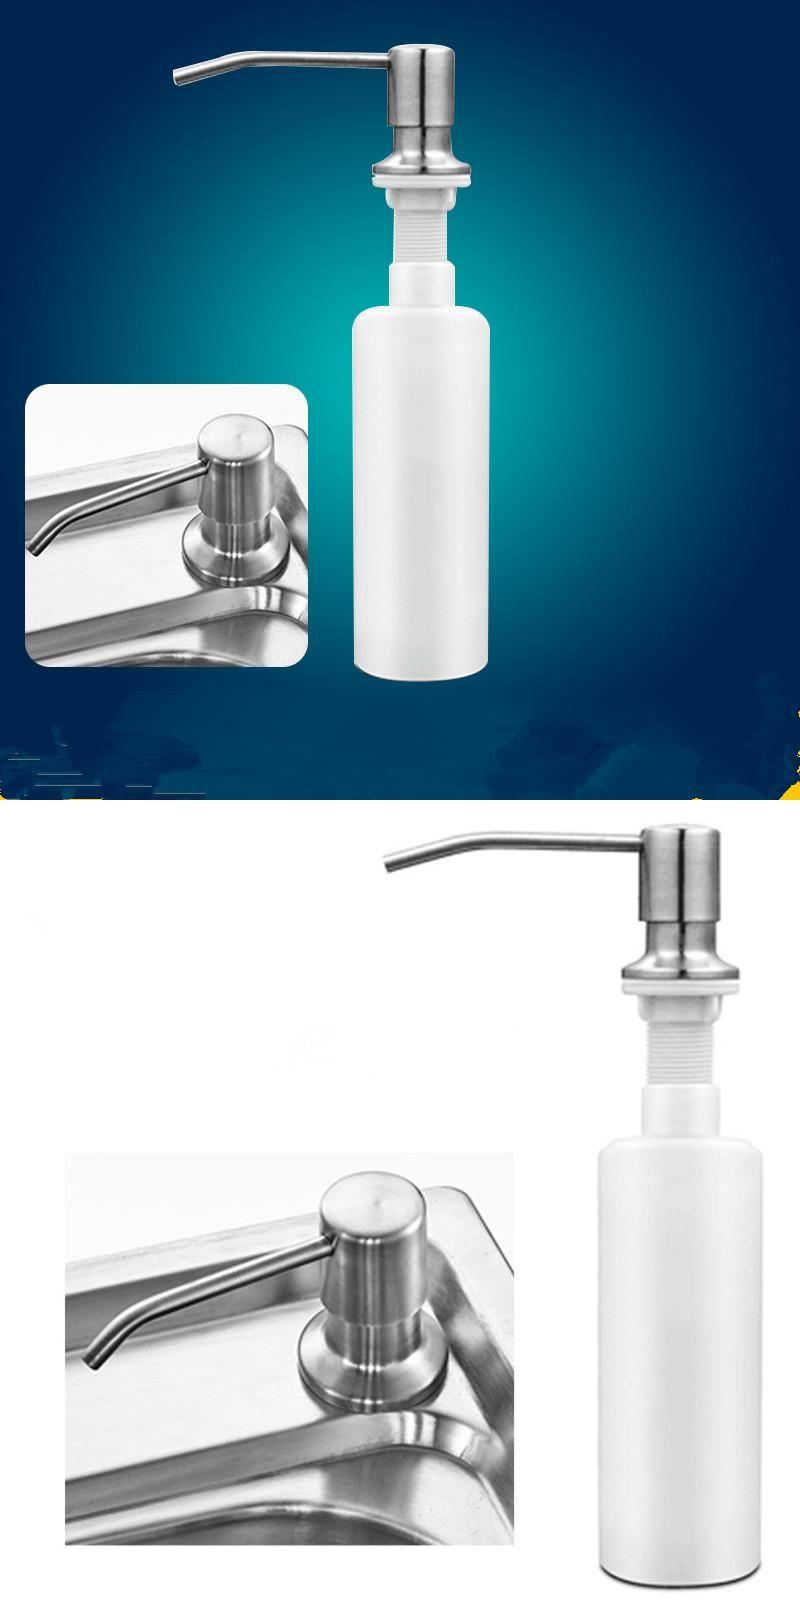 Universal Home Bathroom Kitchen Liquid Soap Dispenser Bottle Silver ...